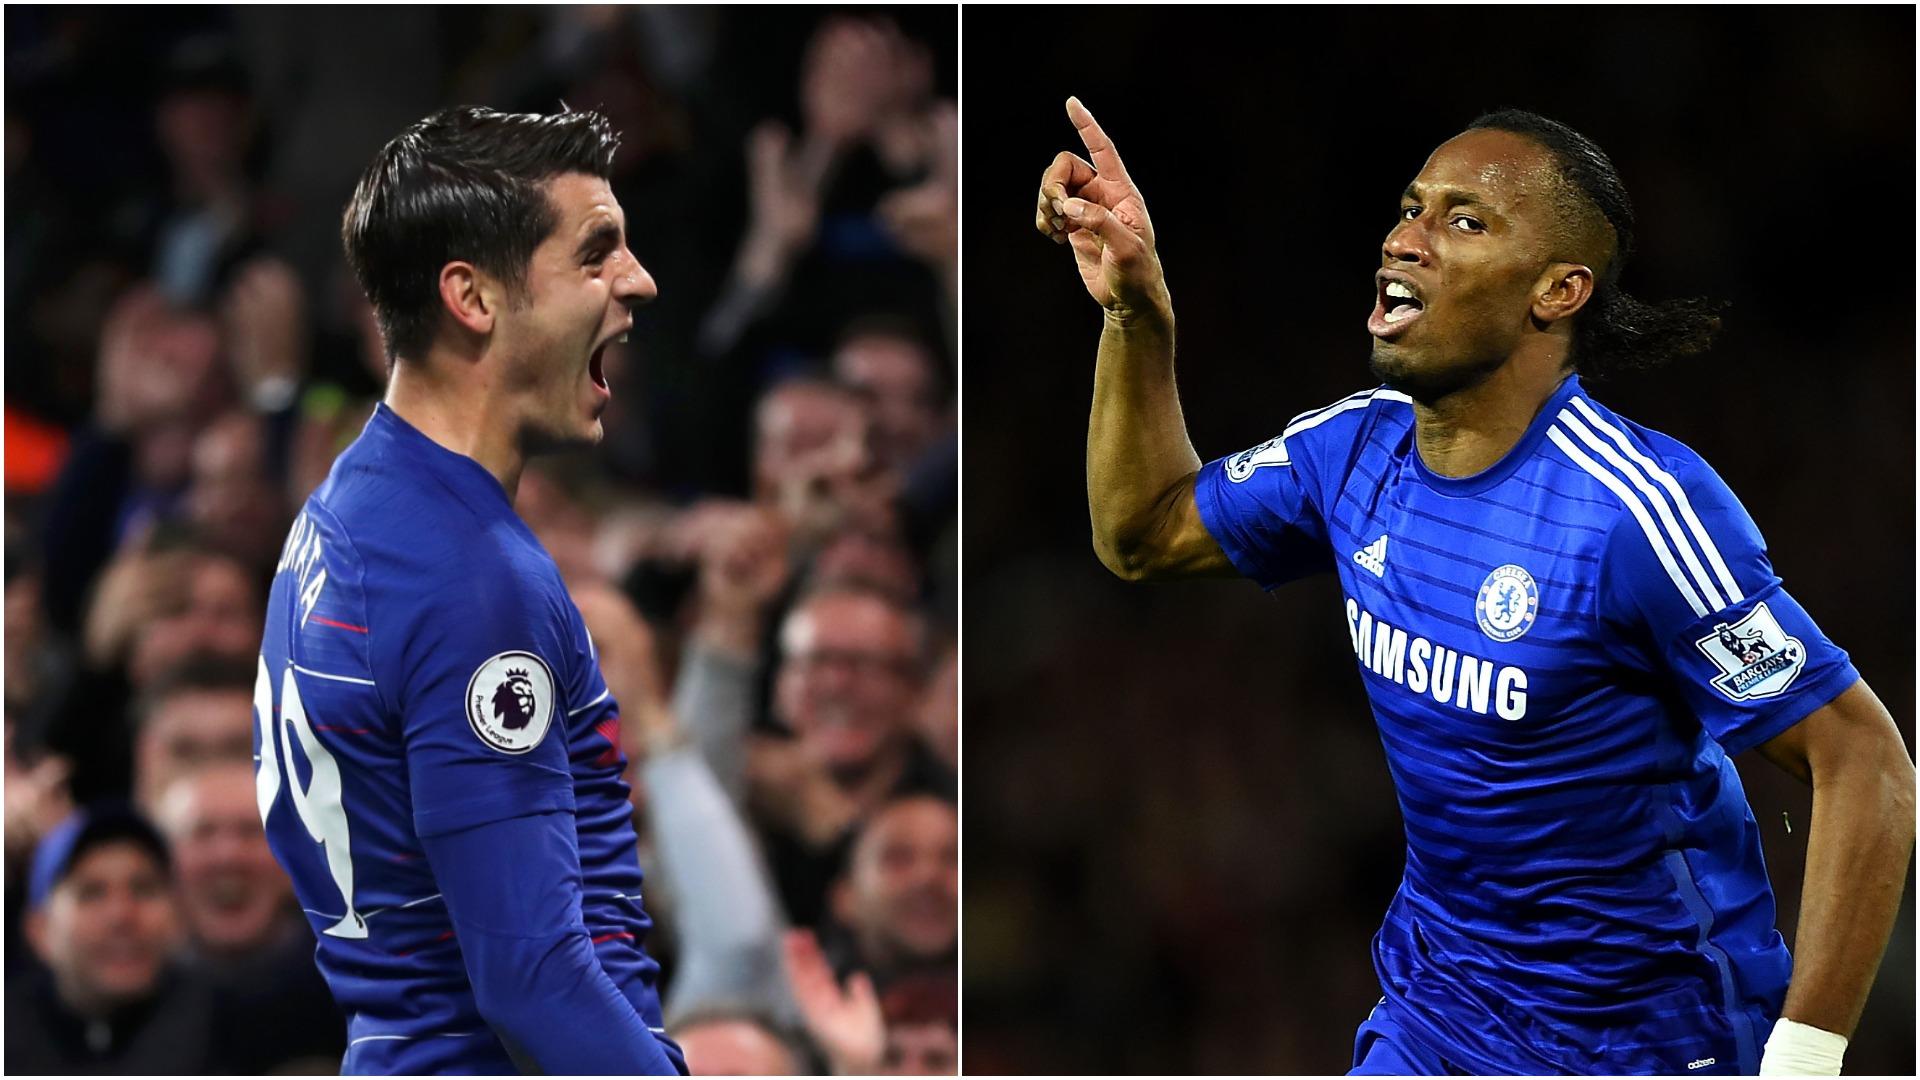 Misfiring Morata or devastating Drogba - how will Pulisic follow Chelsea's biggest buys?